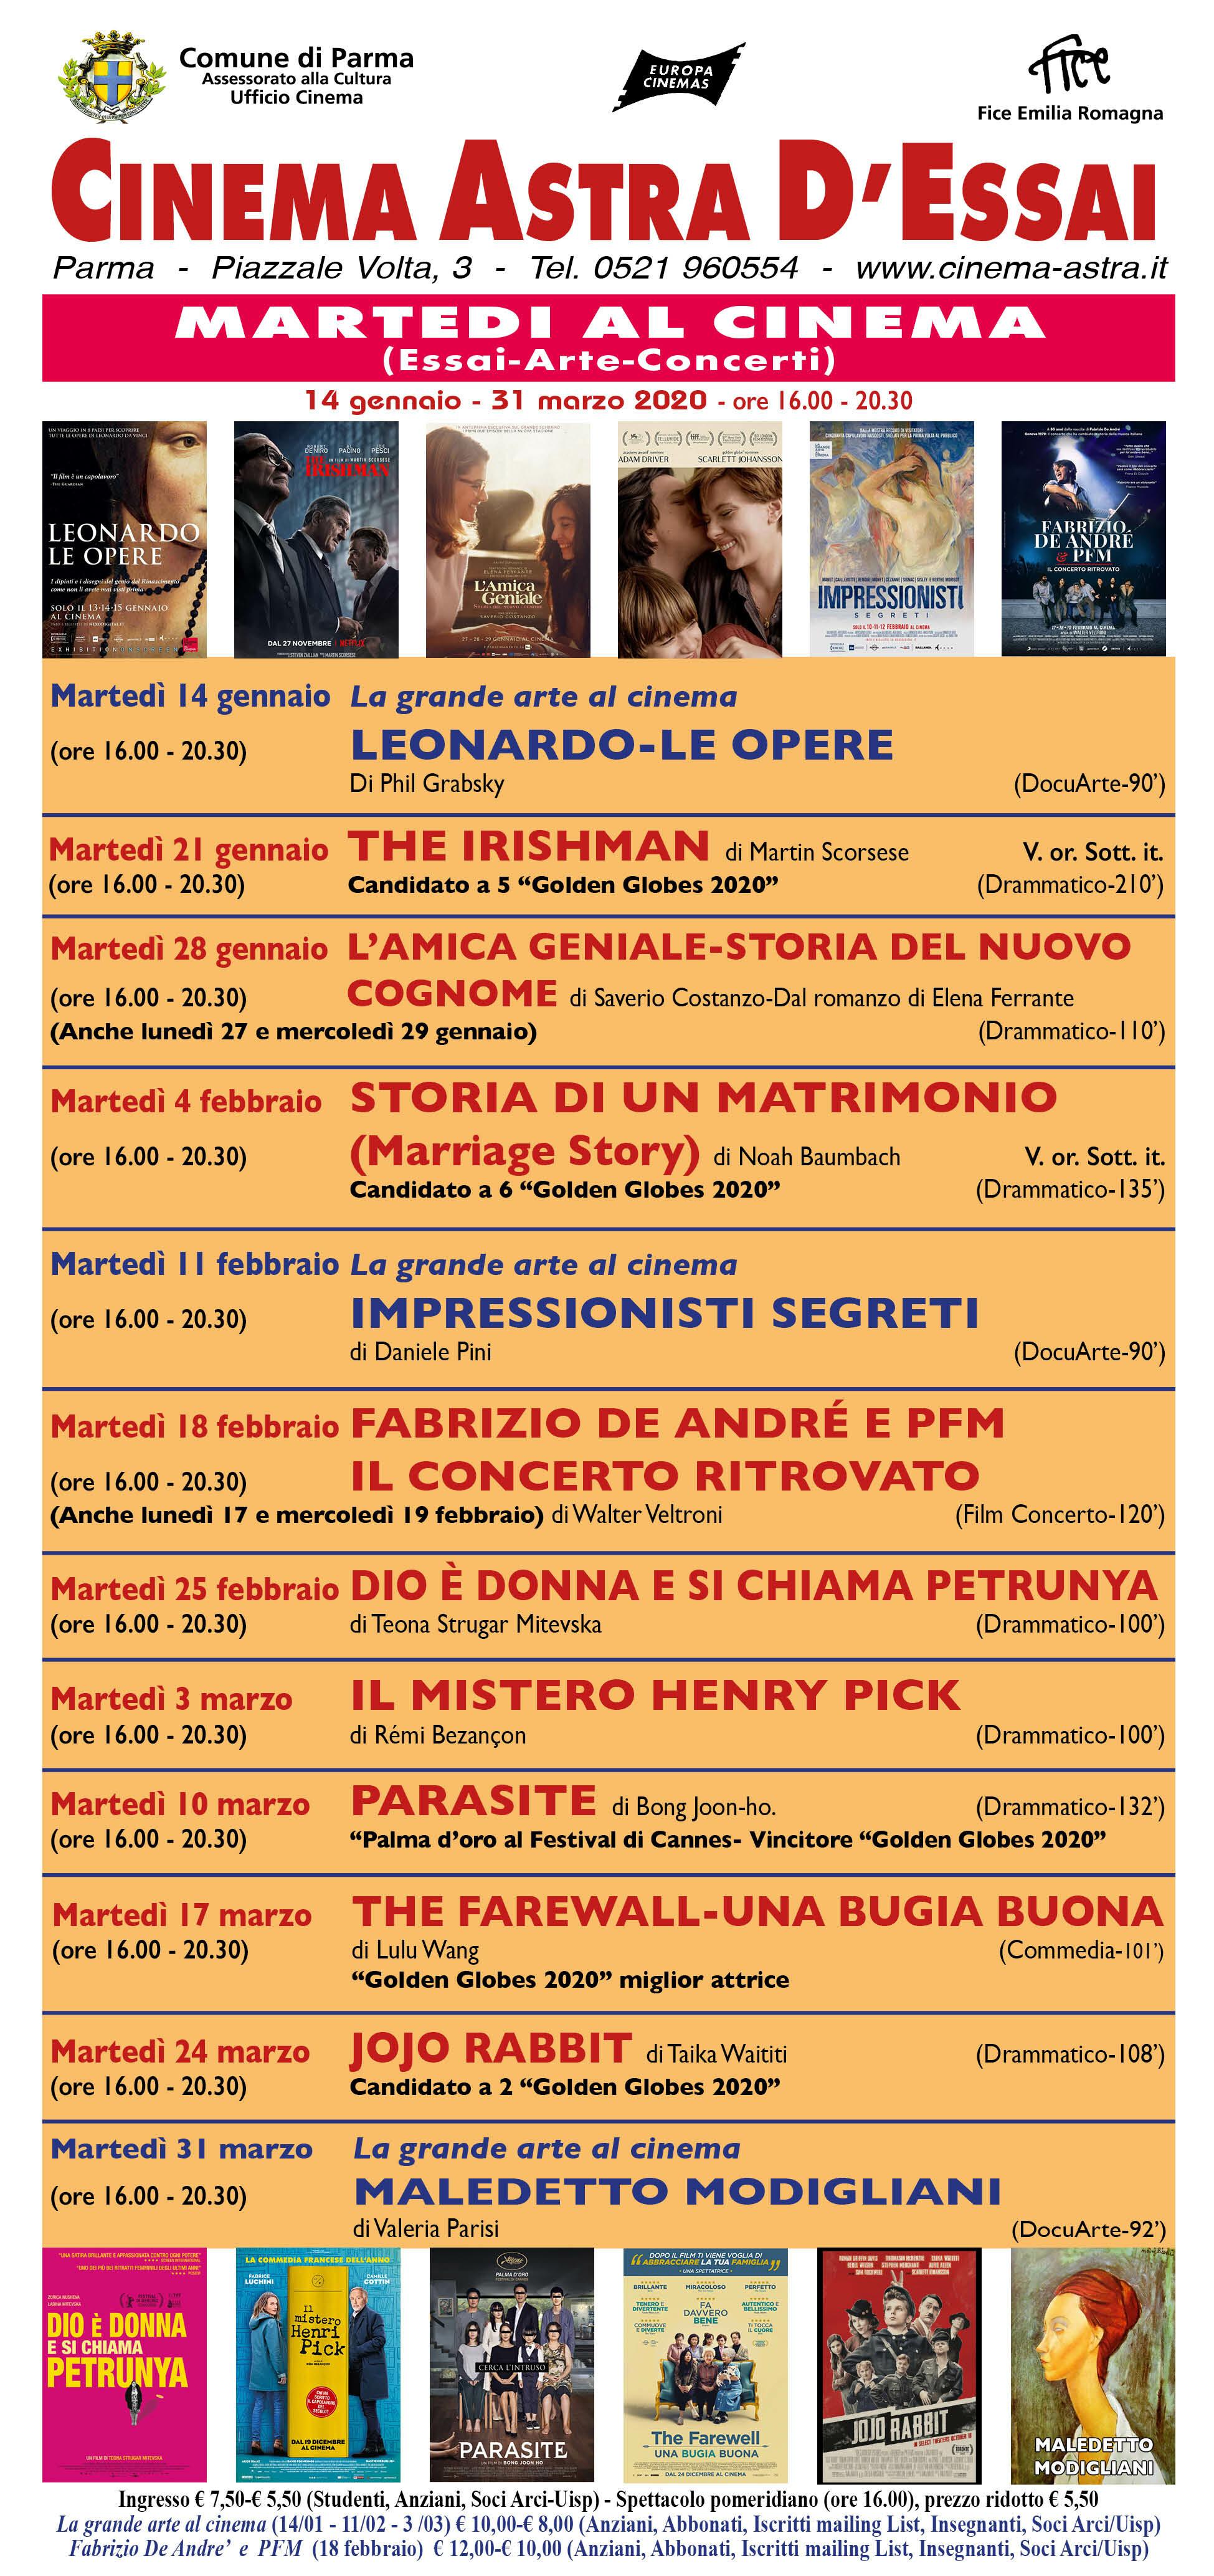 MARTEDI' al cinema (Essai-Arte-Concerti) al CINEMA ASTRA